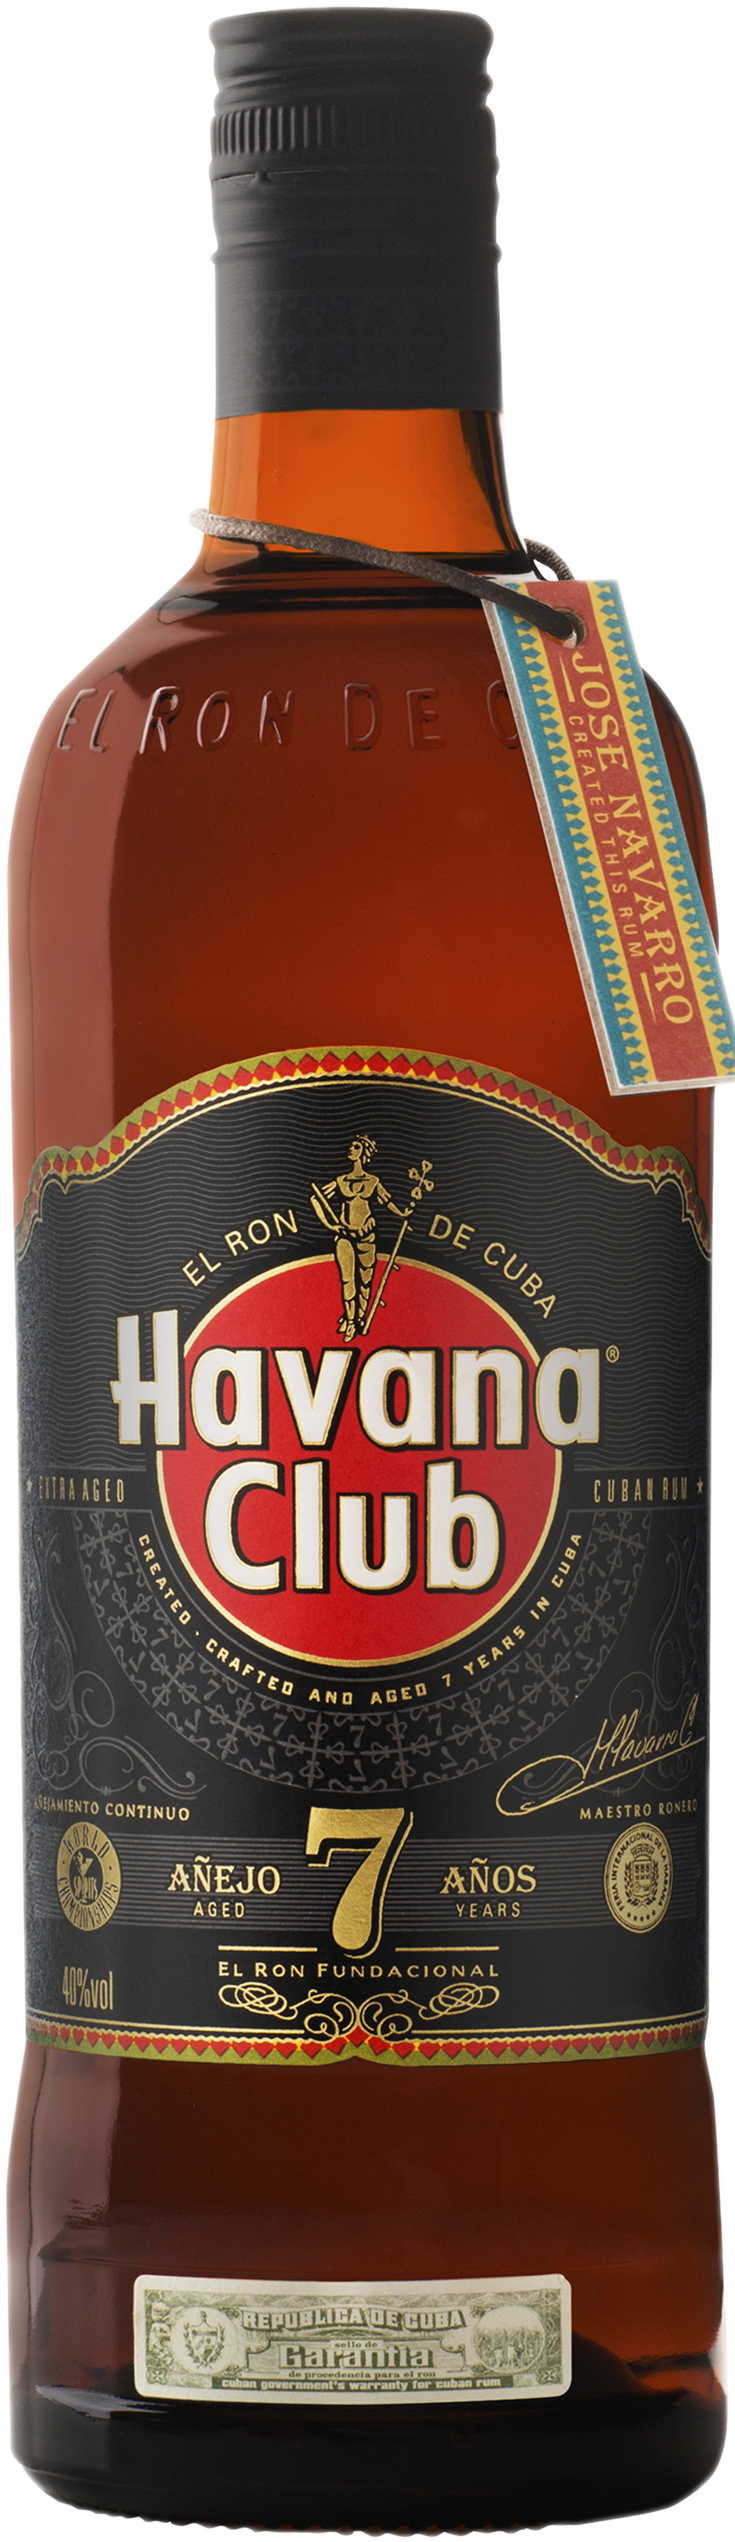 havana_club_